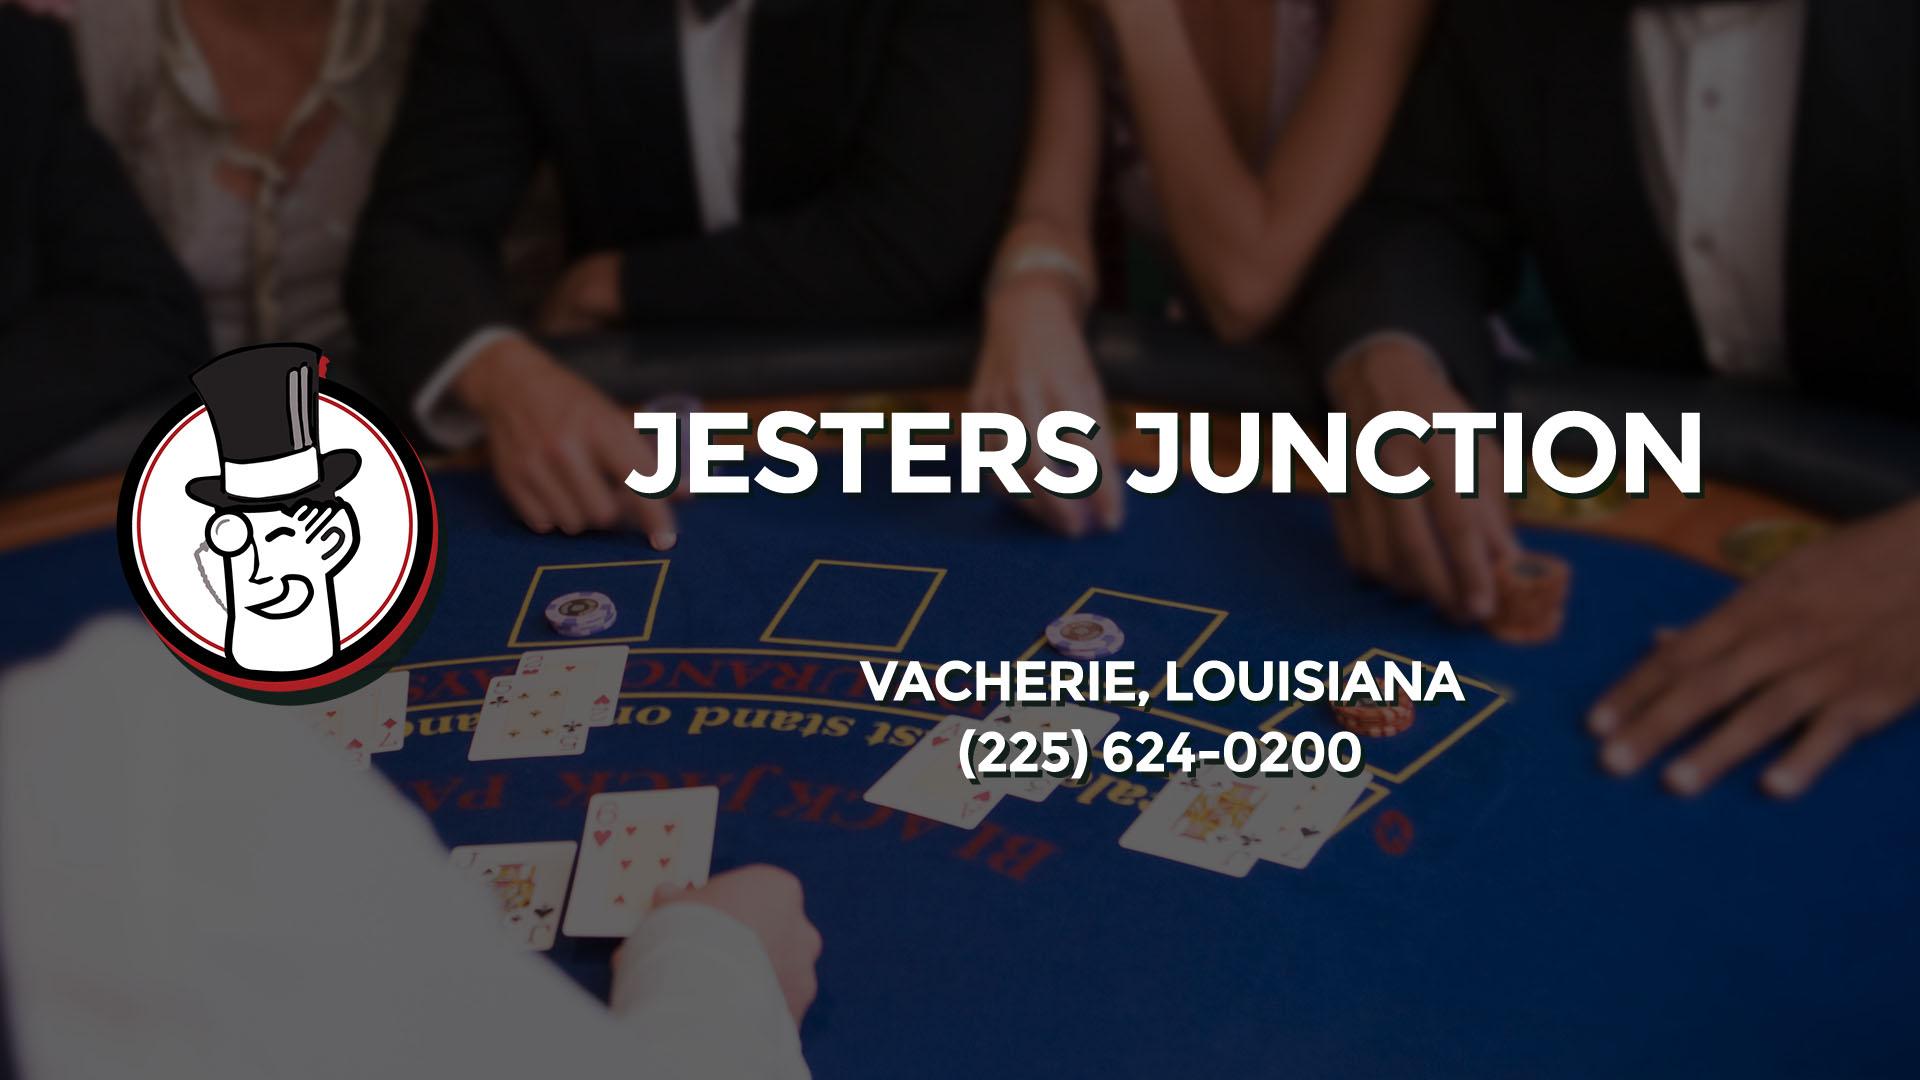 JESTERS JUNCTION VACHERIE LA